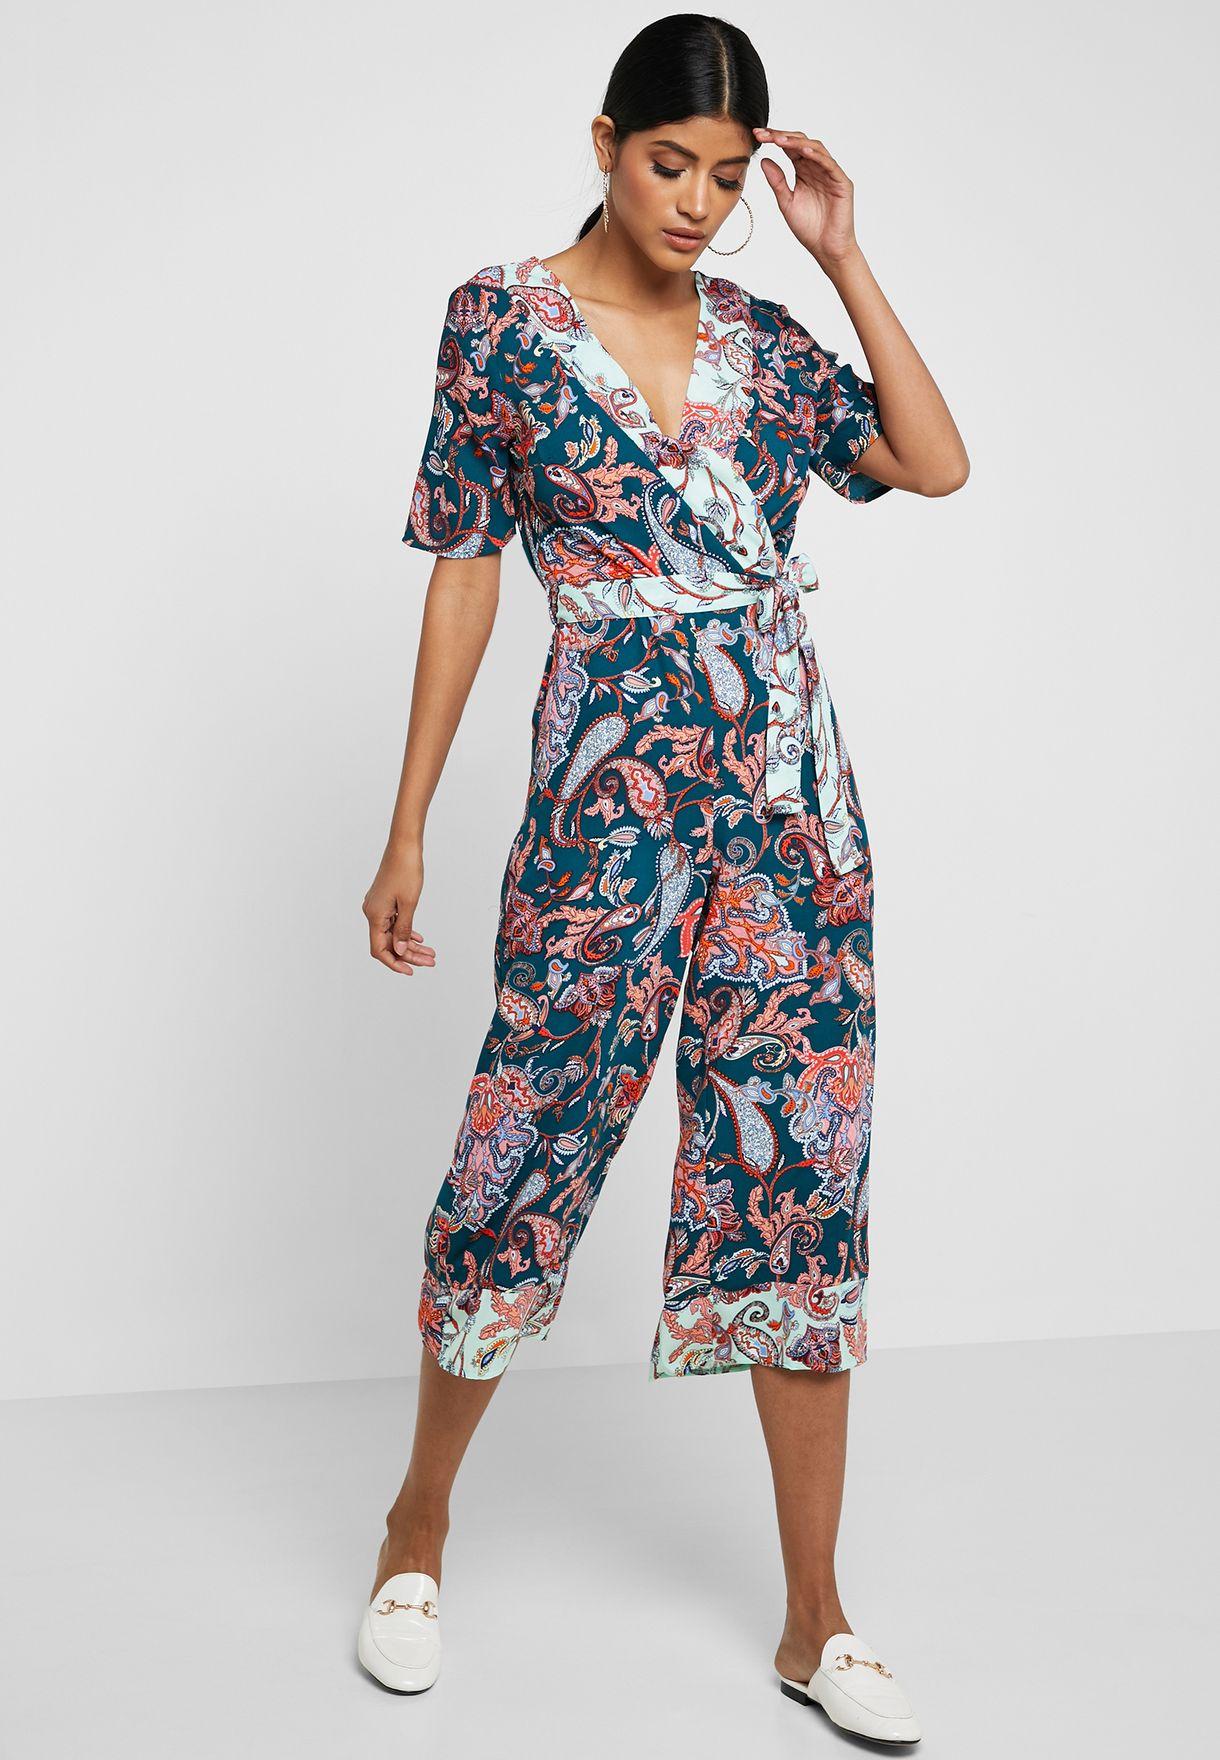 62c63438fae Shop Dorothy Perkins green Paisley Print Surplice Jumpsuit 97294003 for  Women in Bahrain - 18832AT16IBP